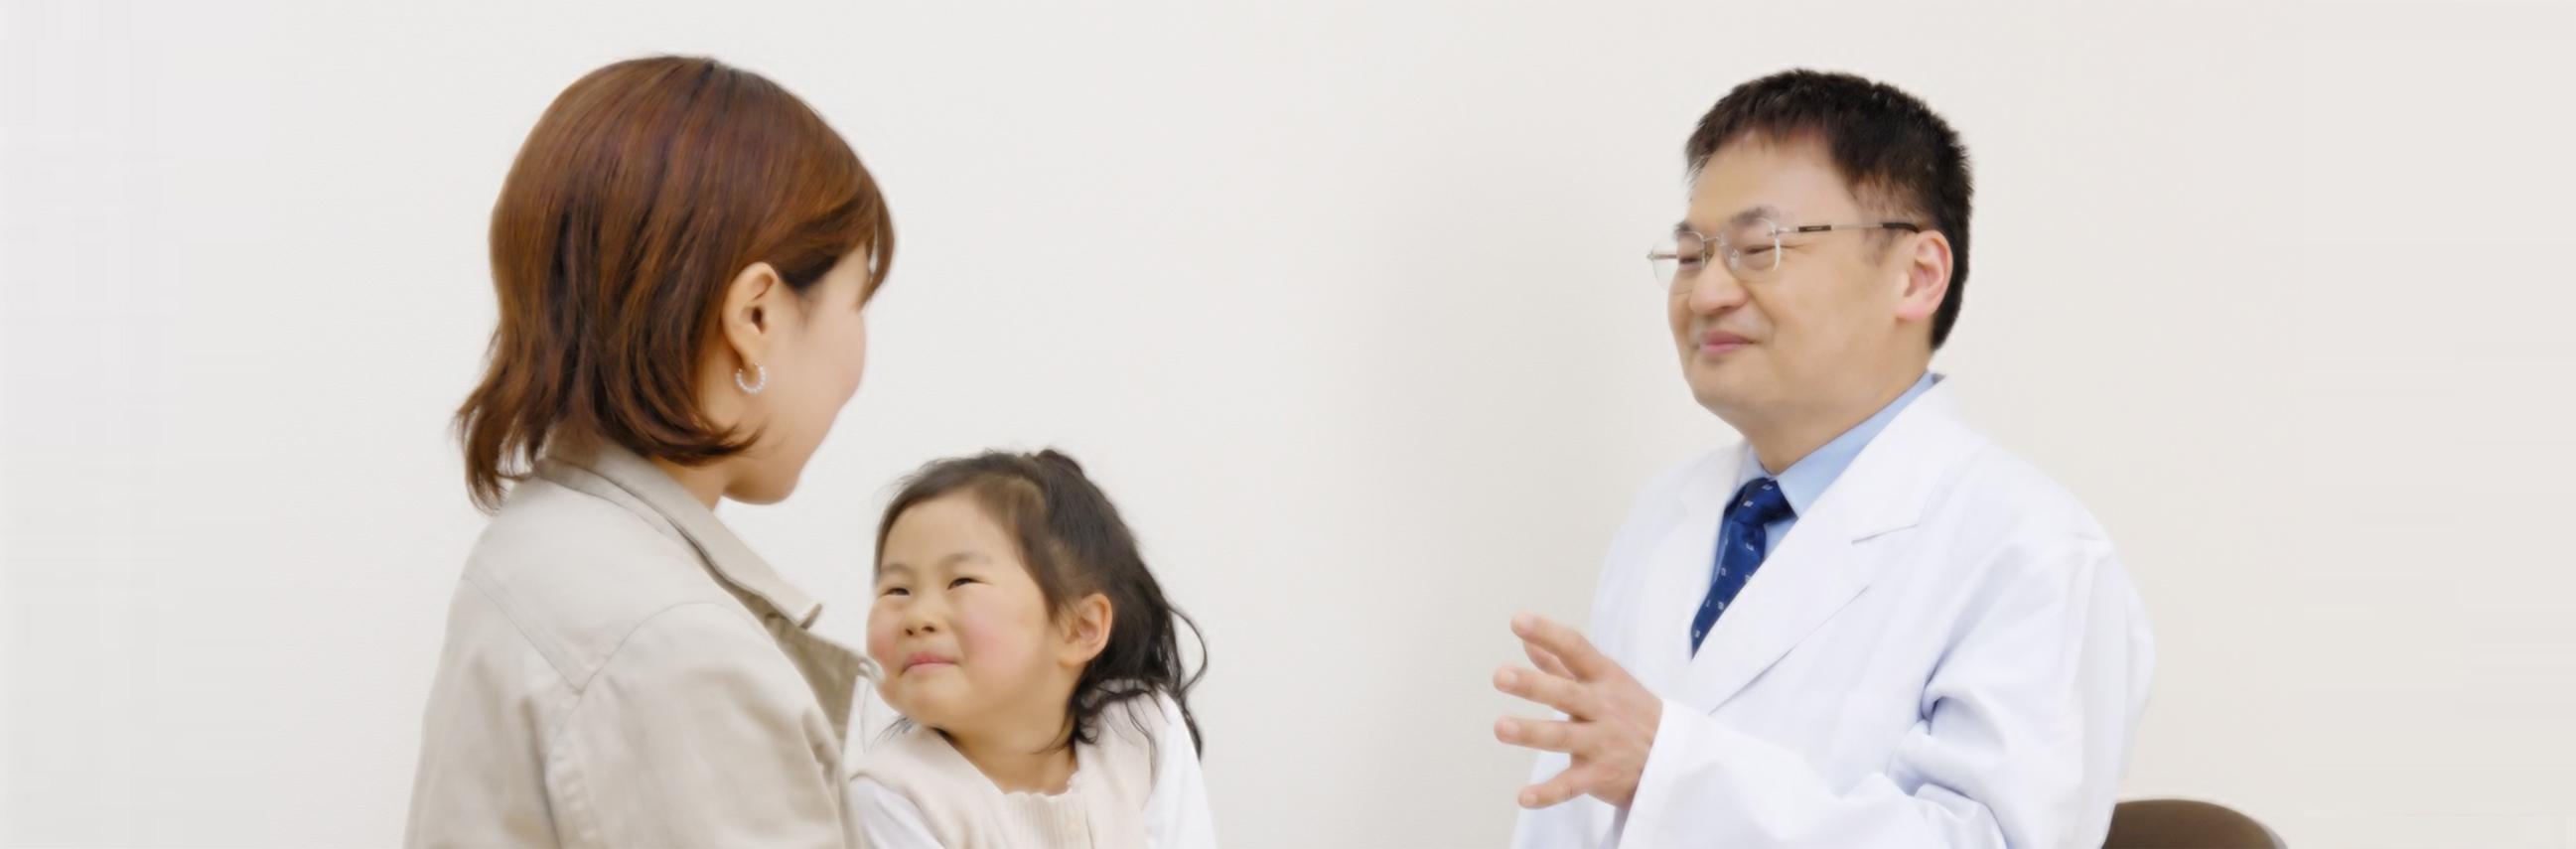 小児眼科 | ヤマネ眼科 - 堺市西区の眼科